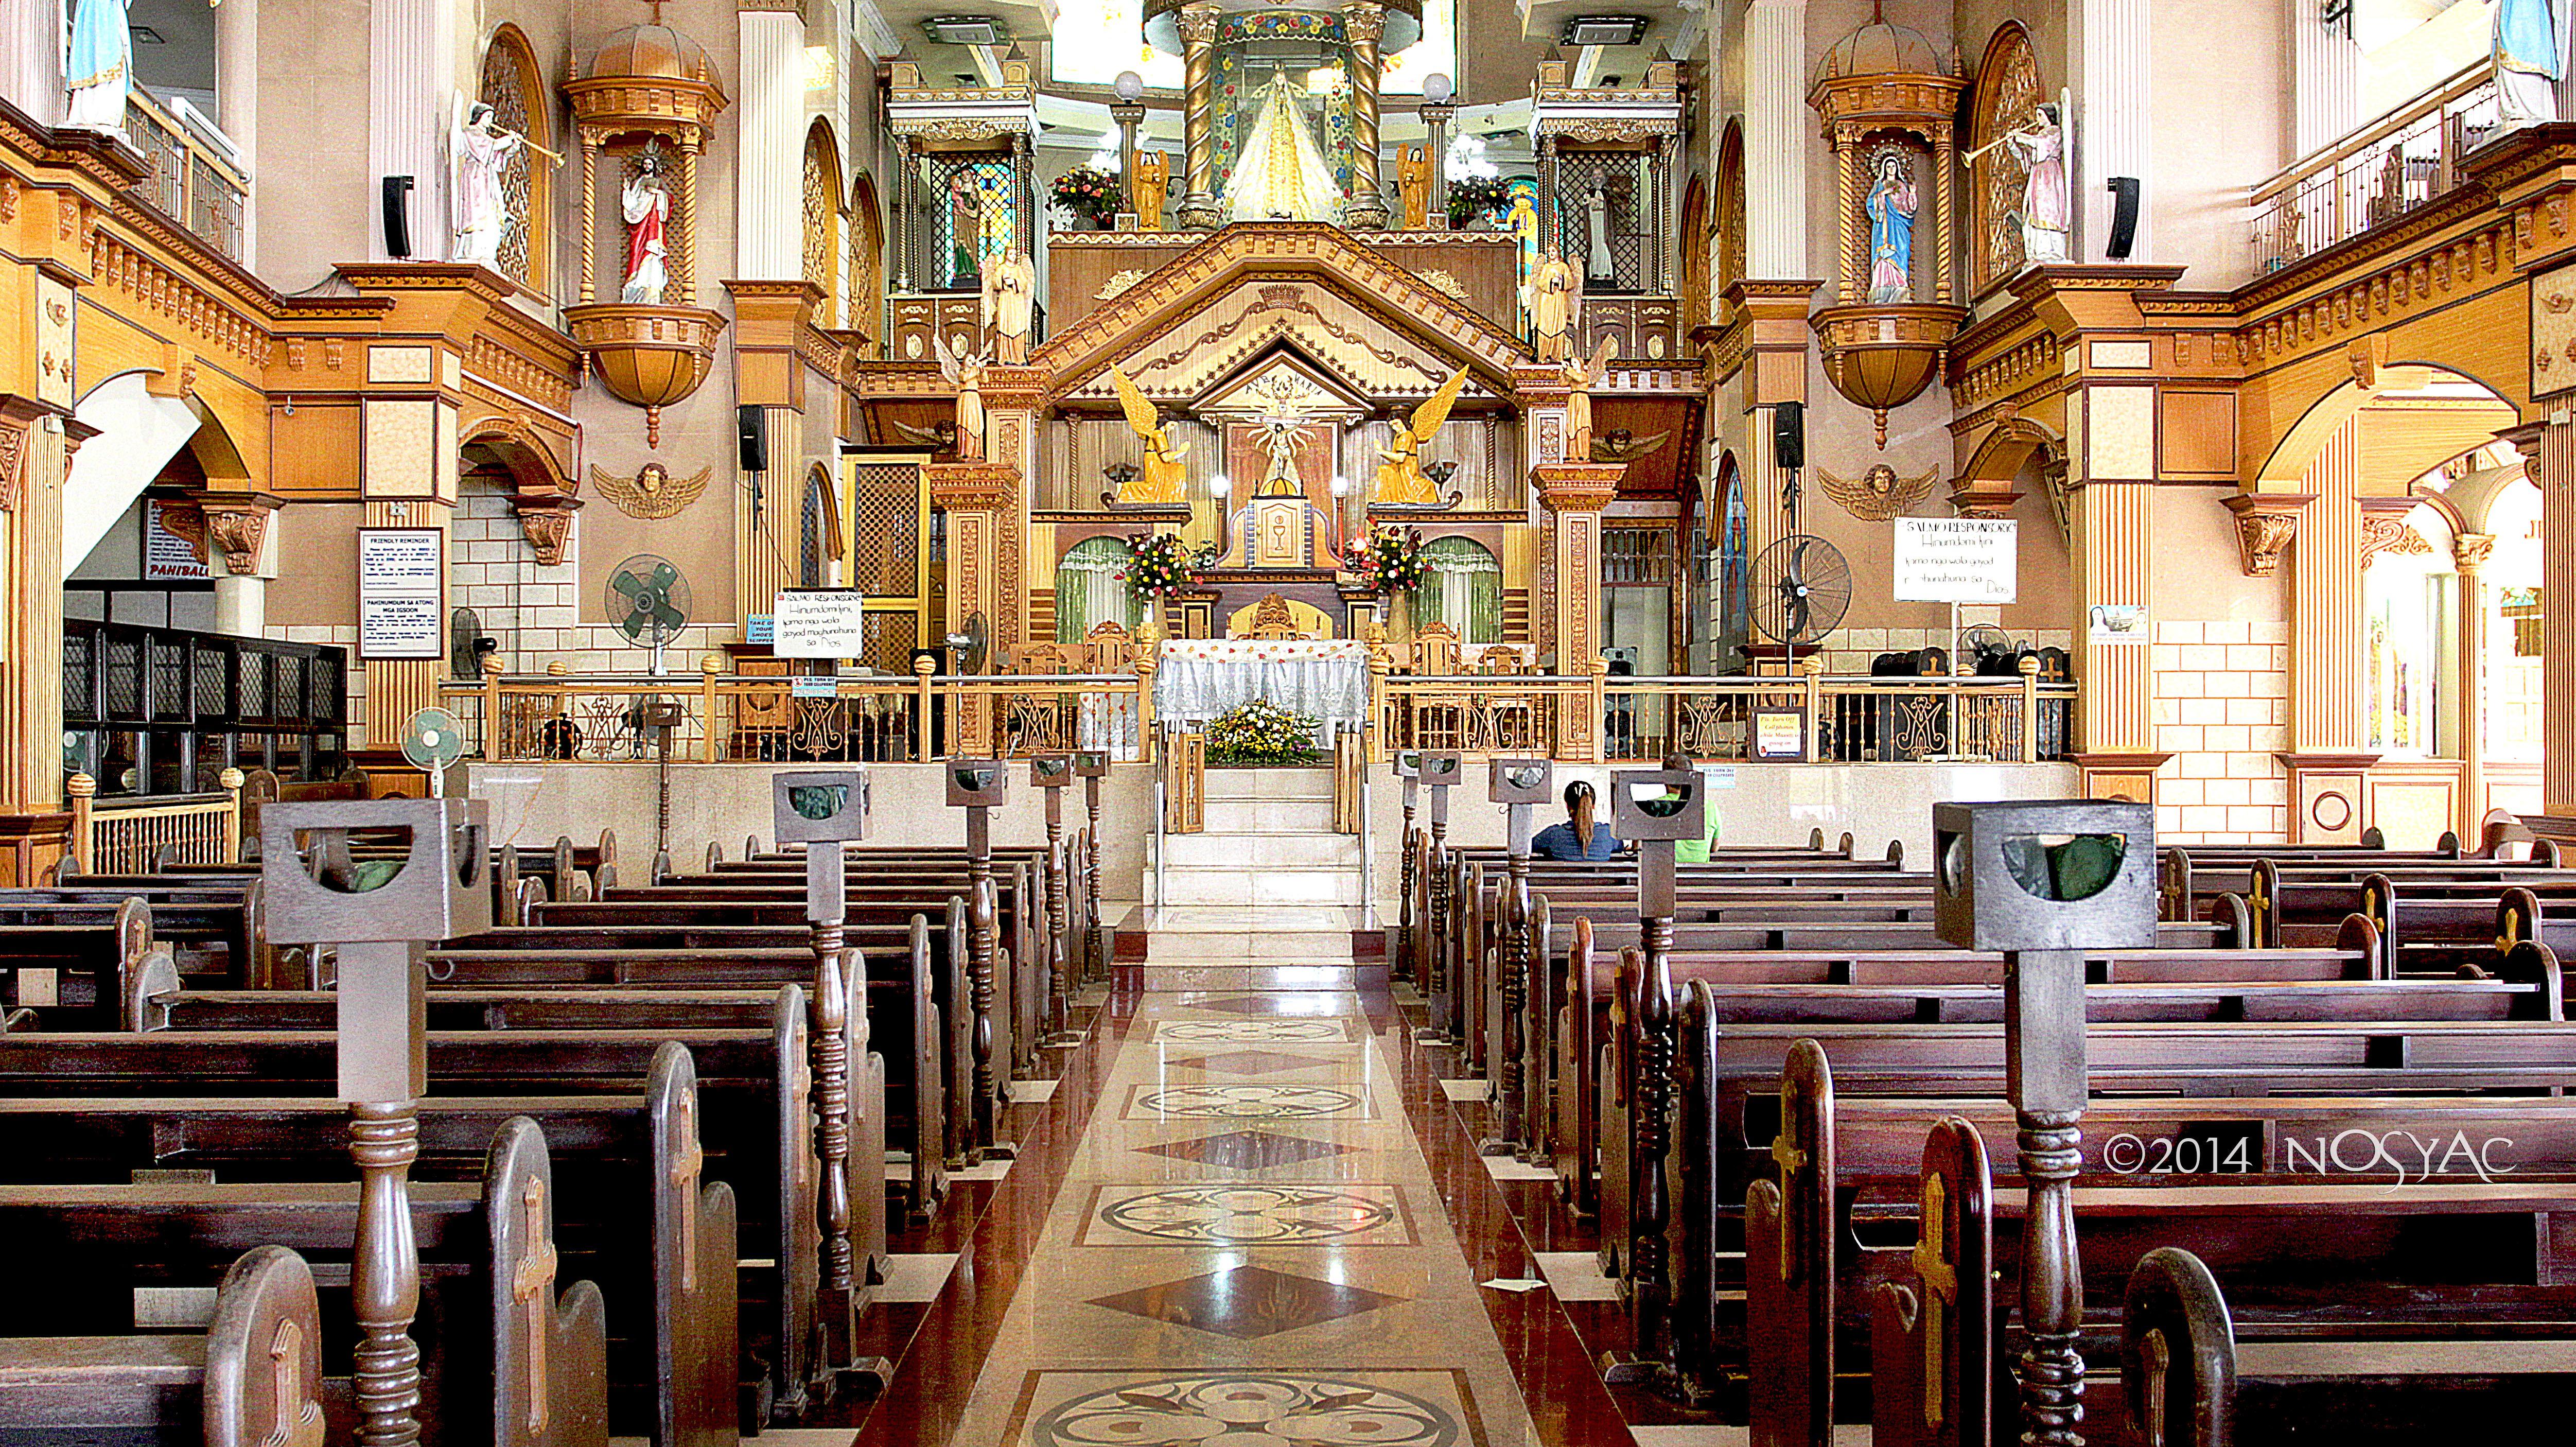 simala sibonga cebu philippines castle church my home